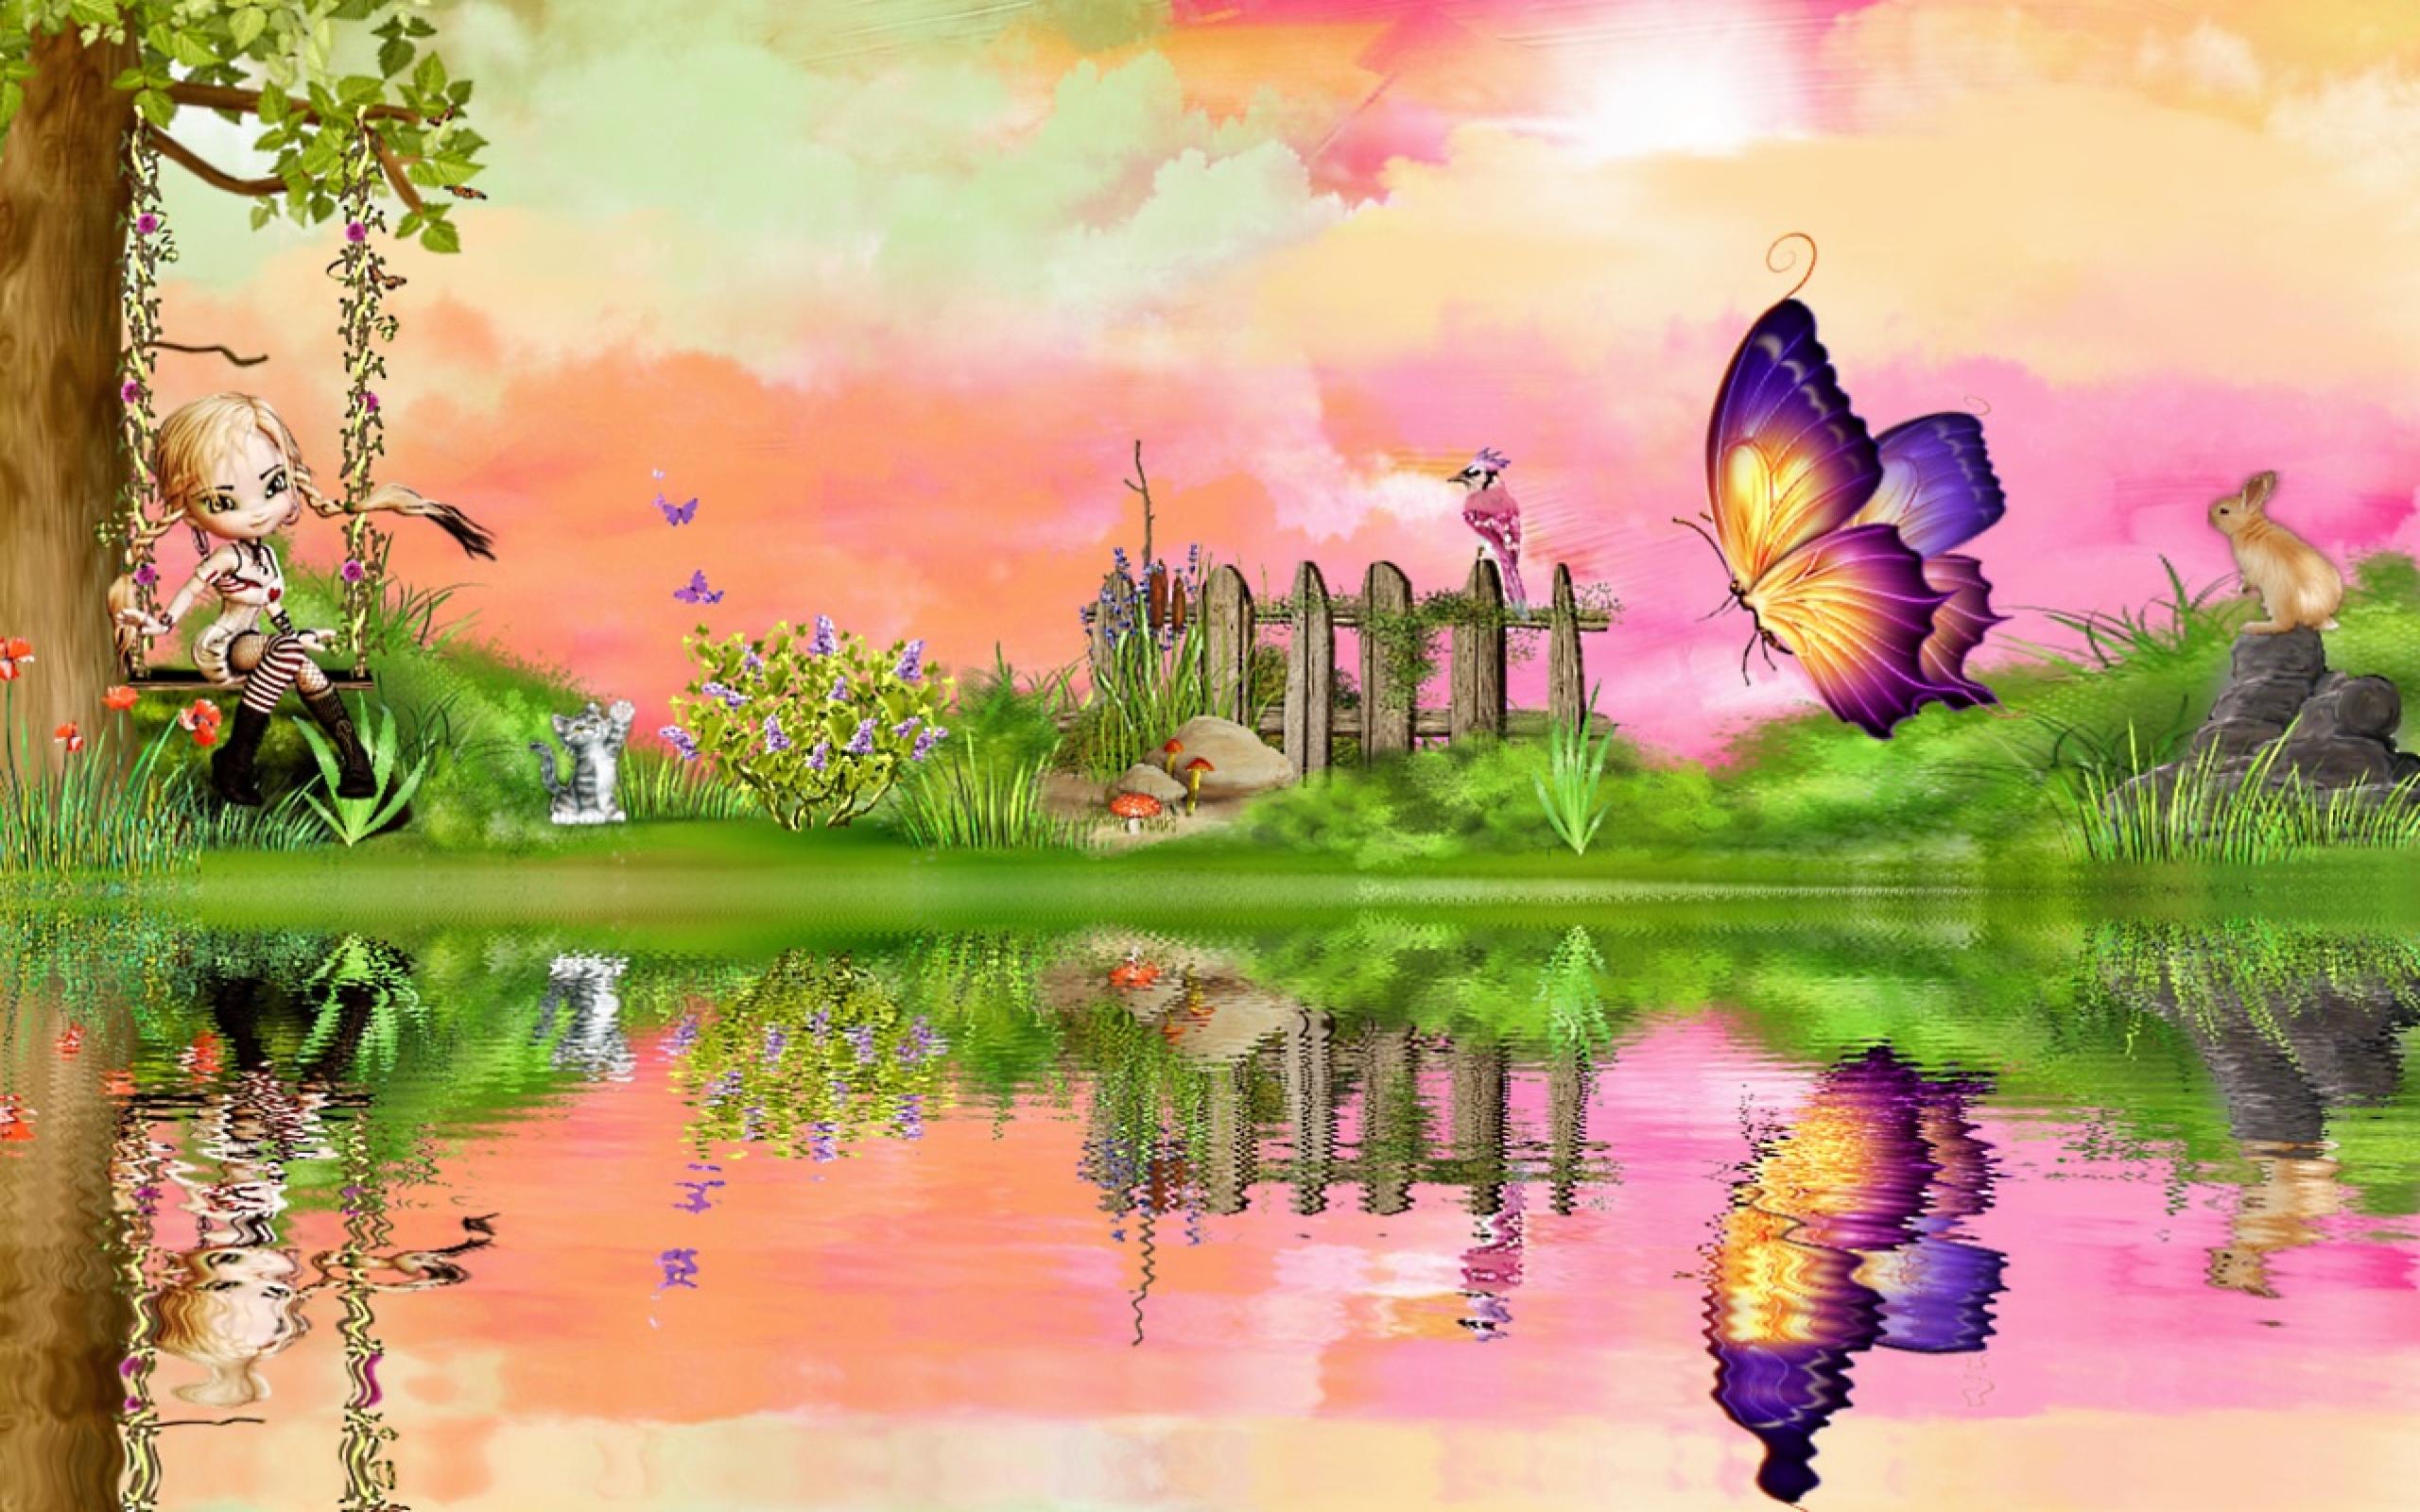 Cute Springtime wallpaper 2560x1600 33482 2560x1600